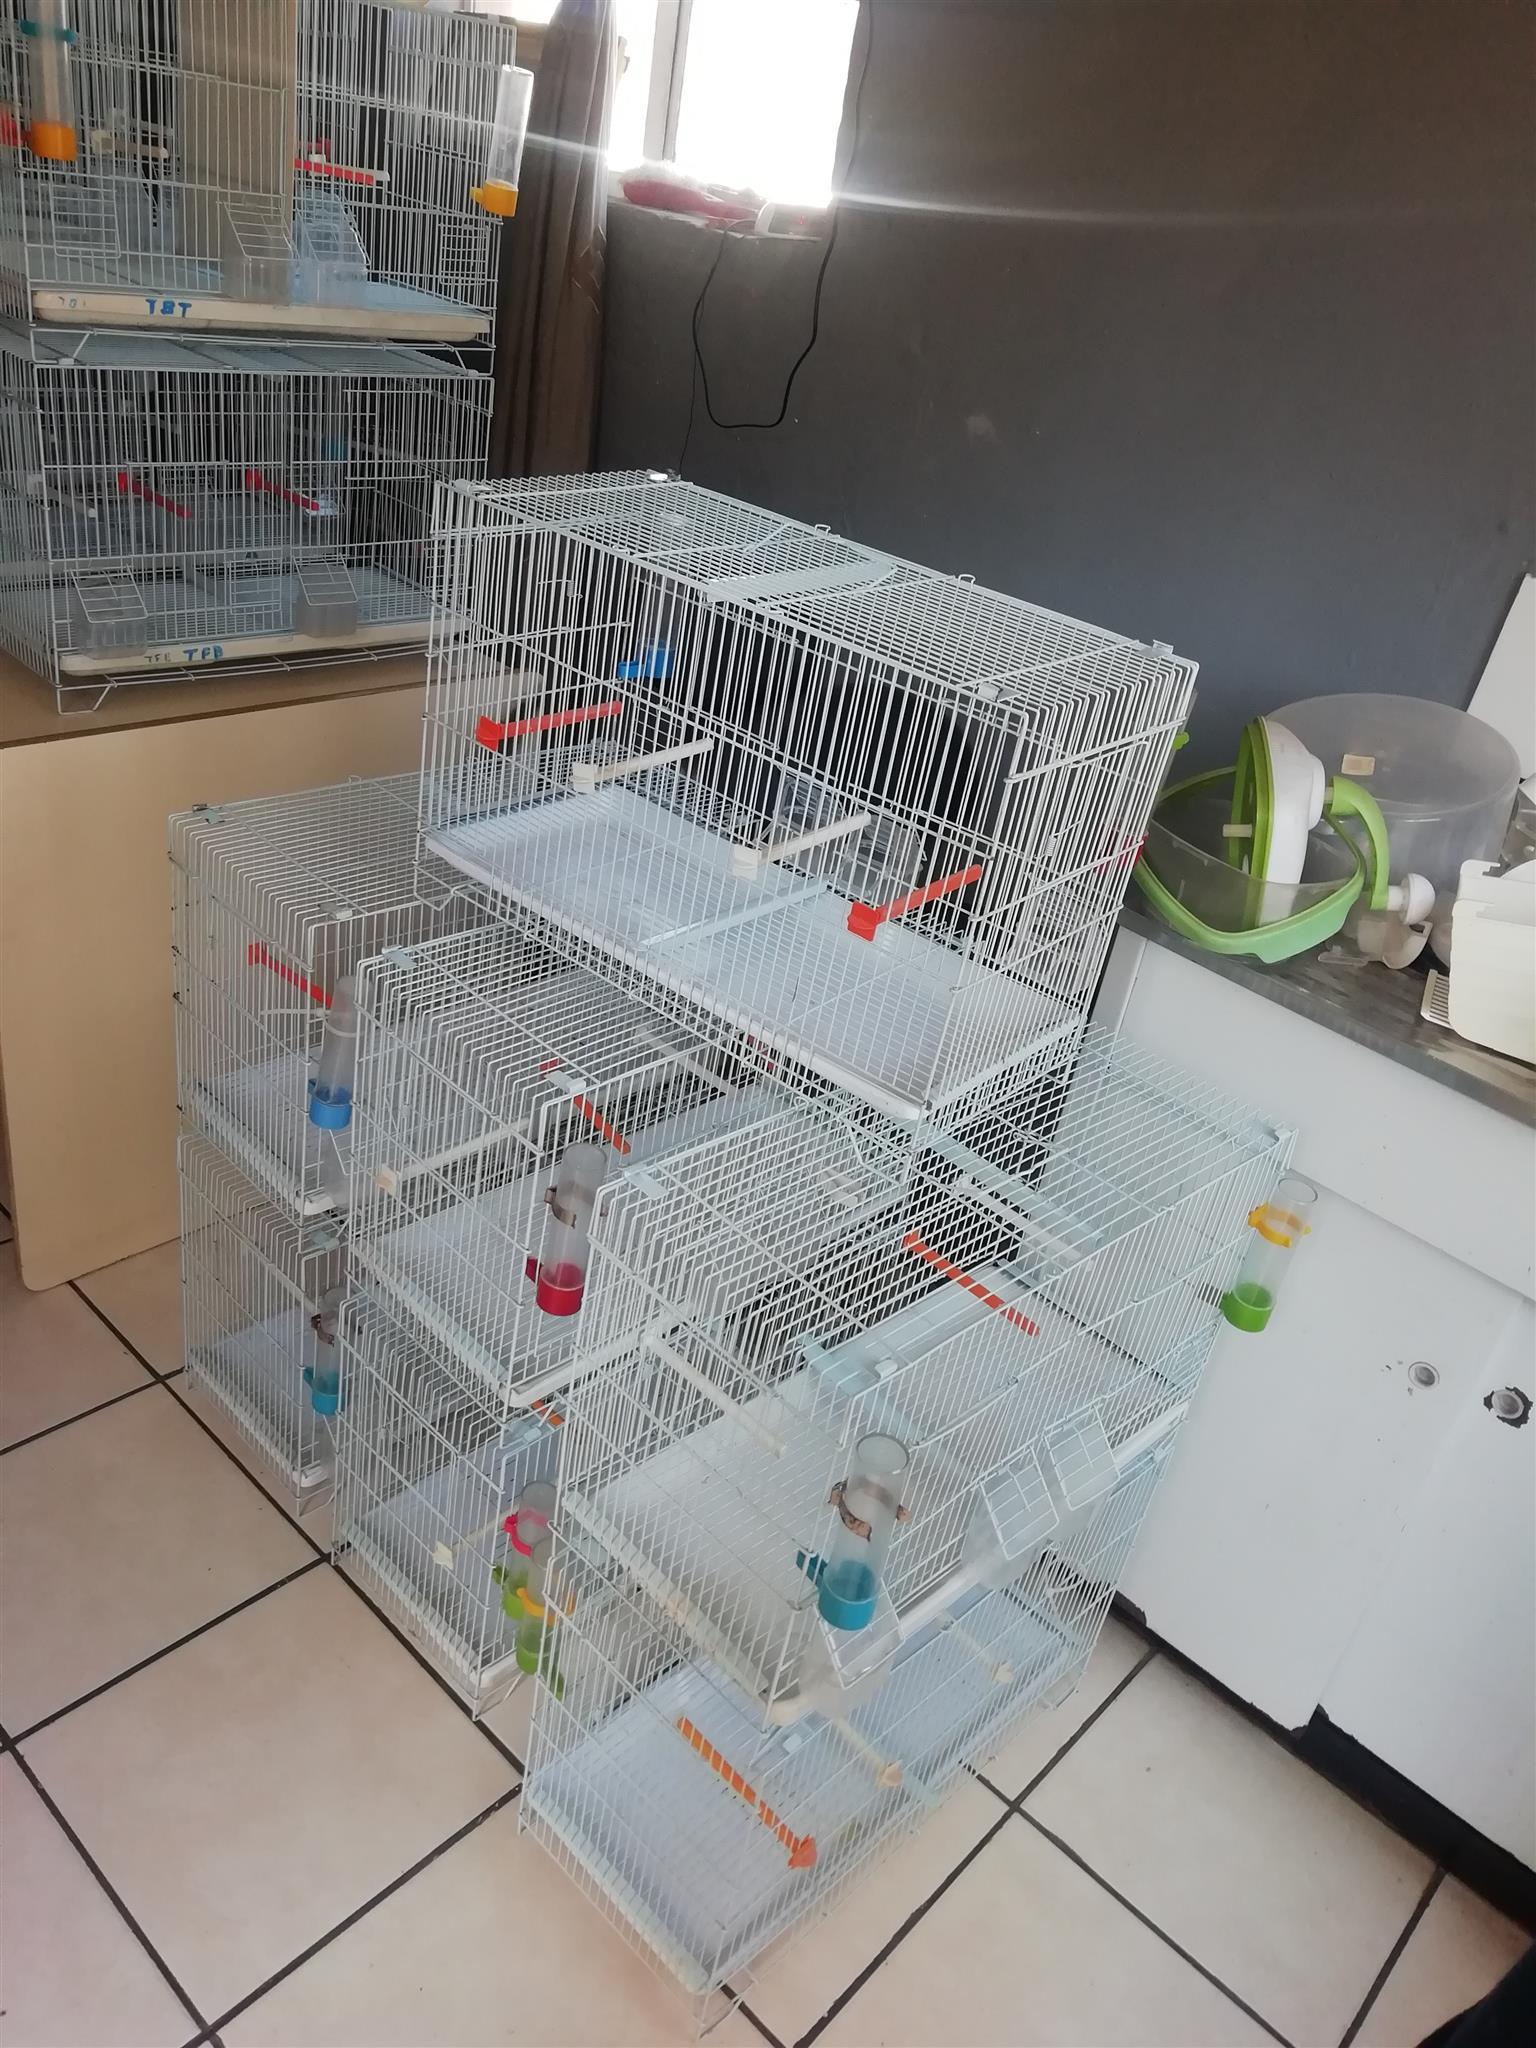 Double breeding bird cages